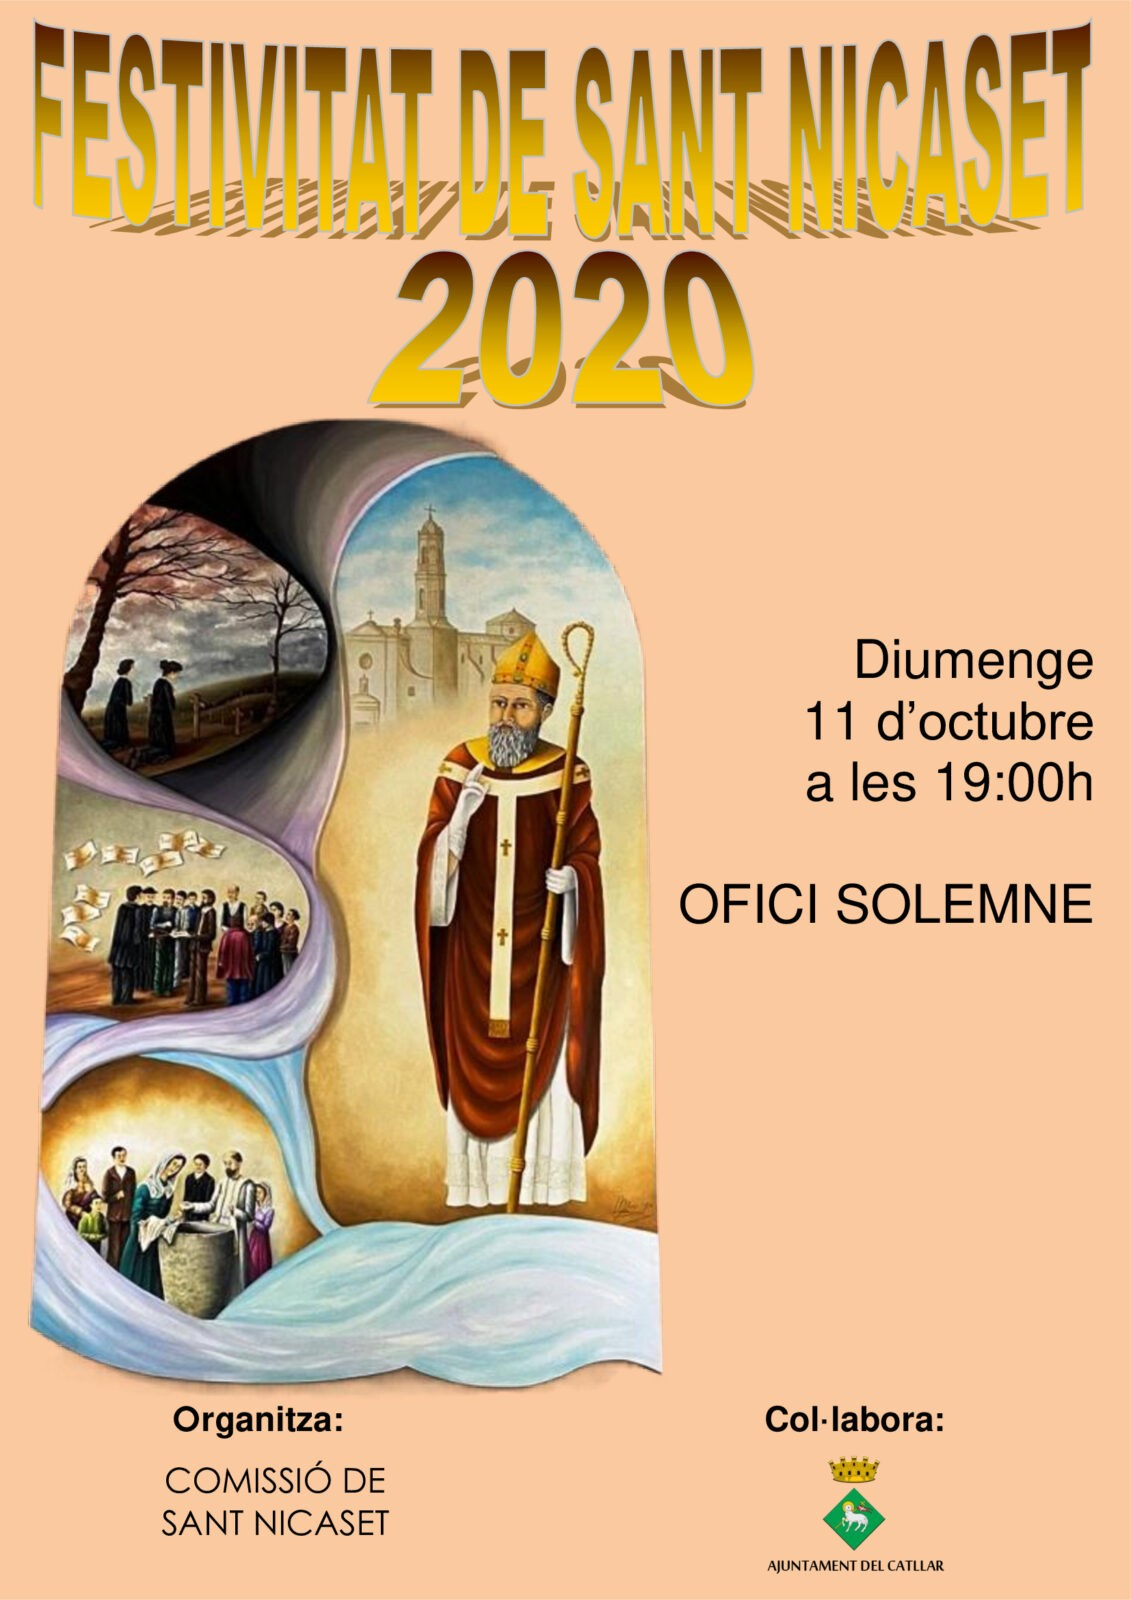 FESTIVITAT DE SANT NICASET 2020